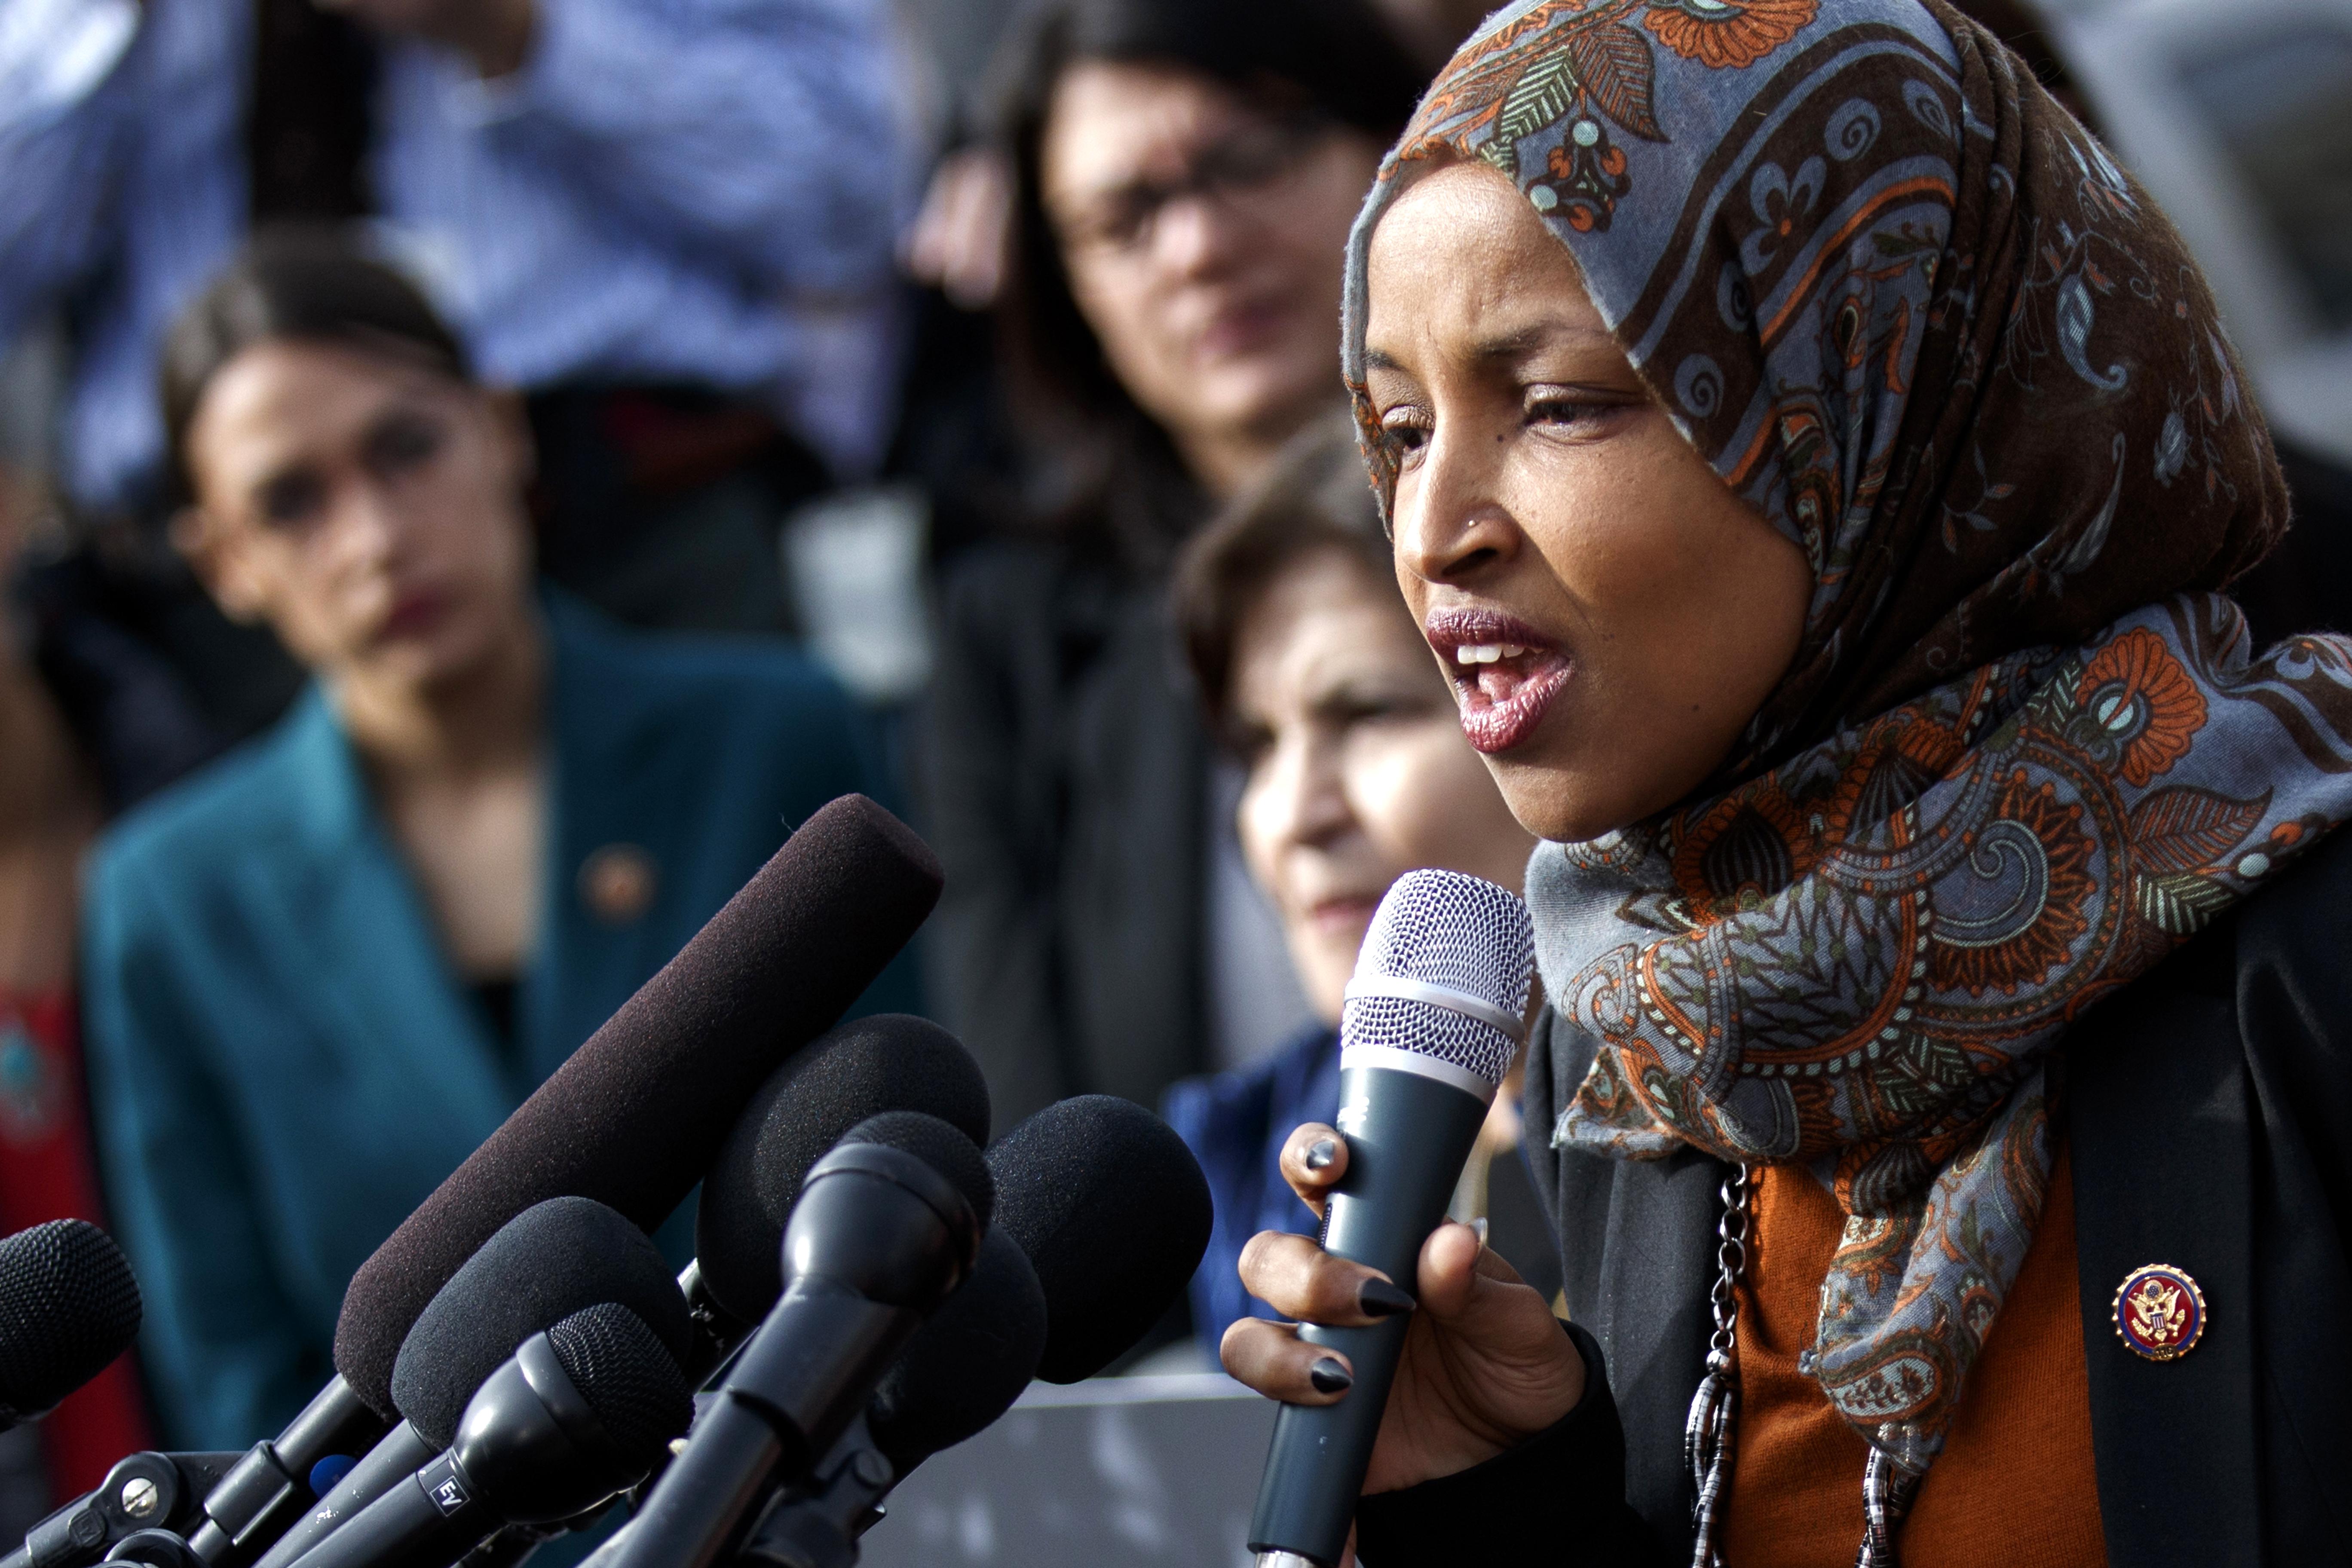 Washington - Omar To Keynote Event Alongside Official Who